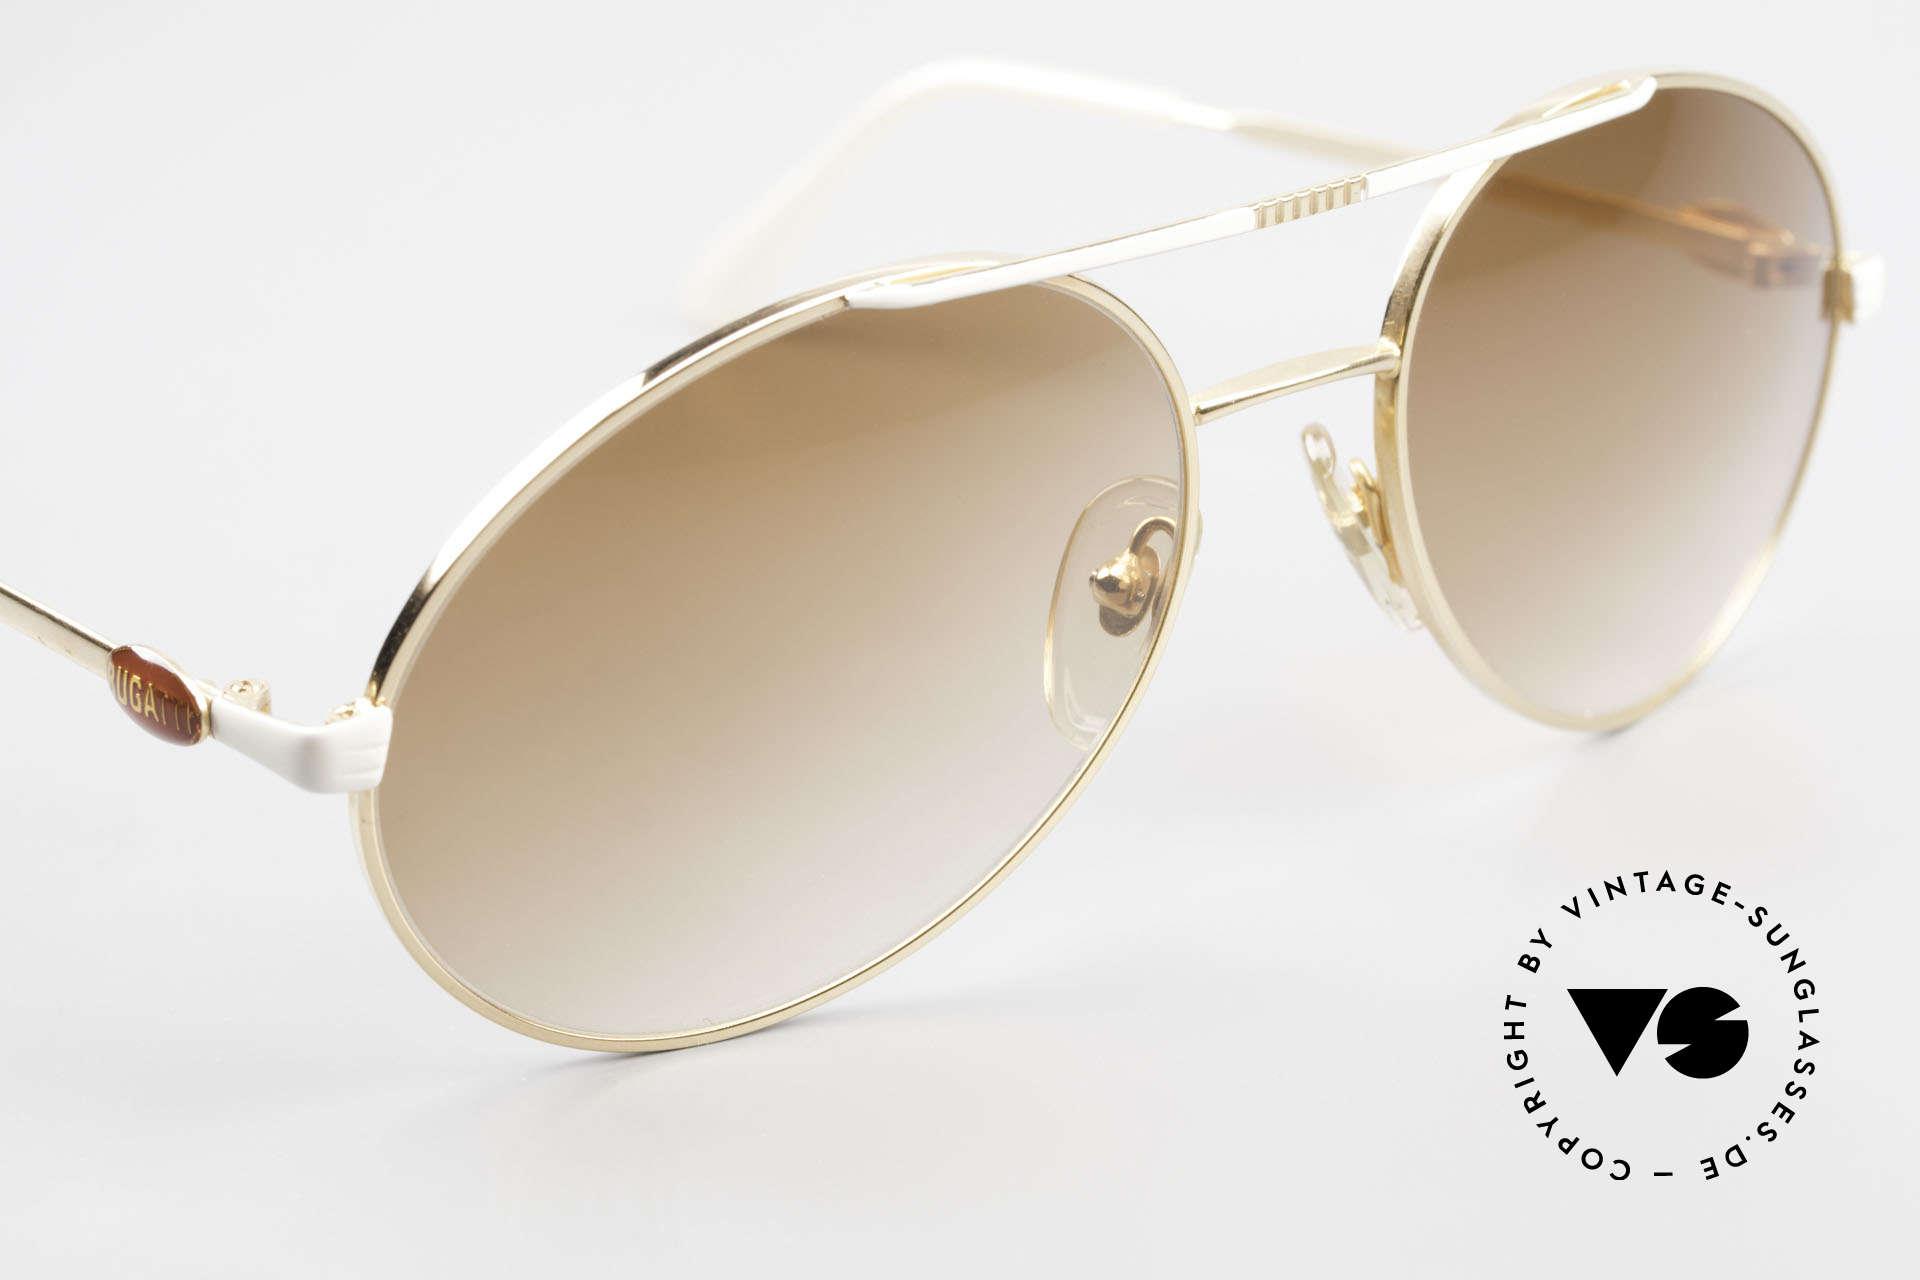 Bugatti 64317 Men's Sunglasses 80's Vintage, unworn (like all our vintage Bugatti shades), Made for Men